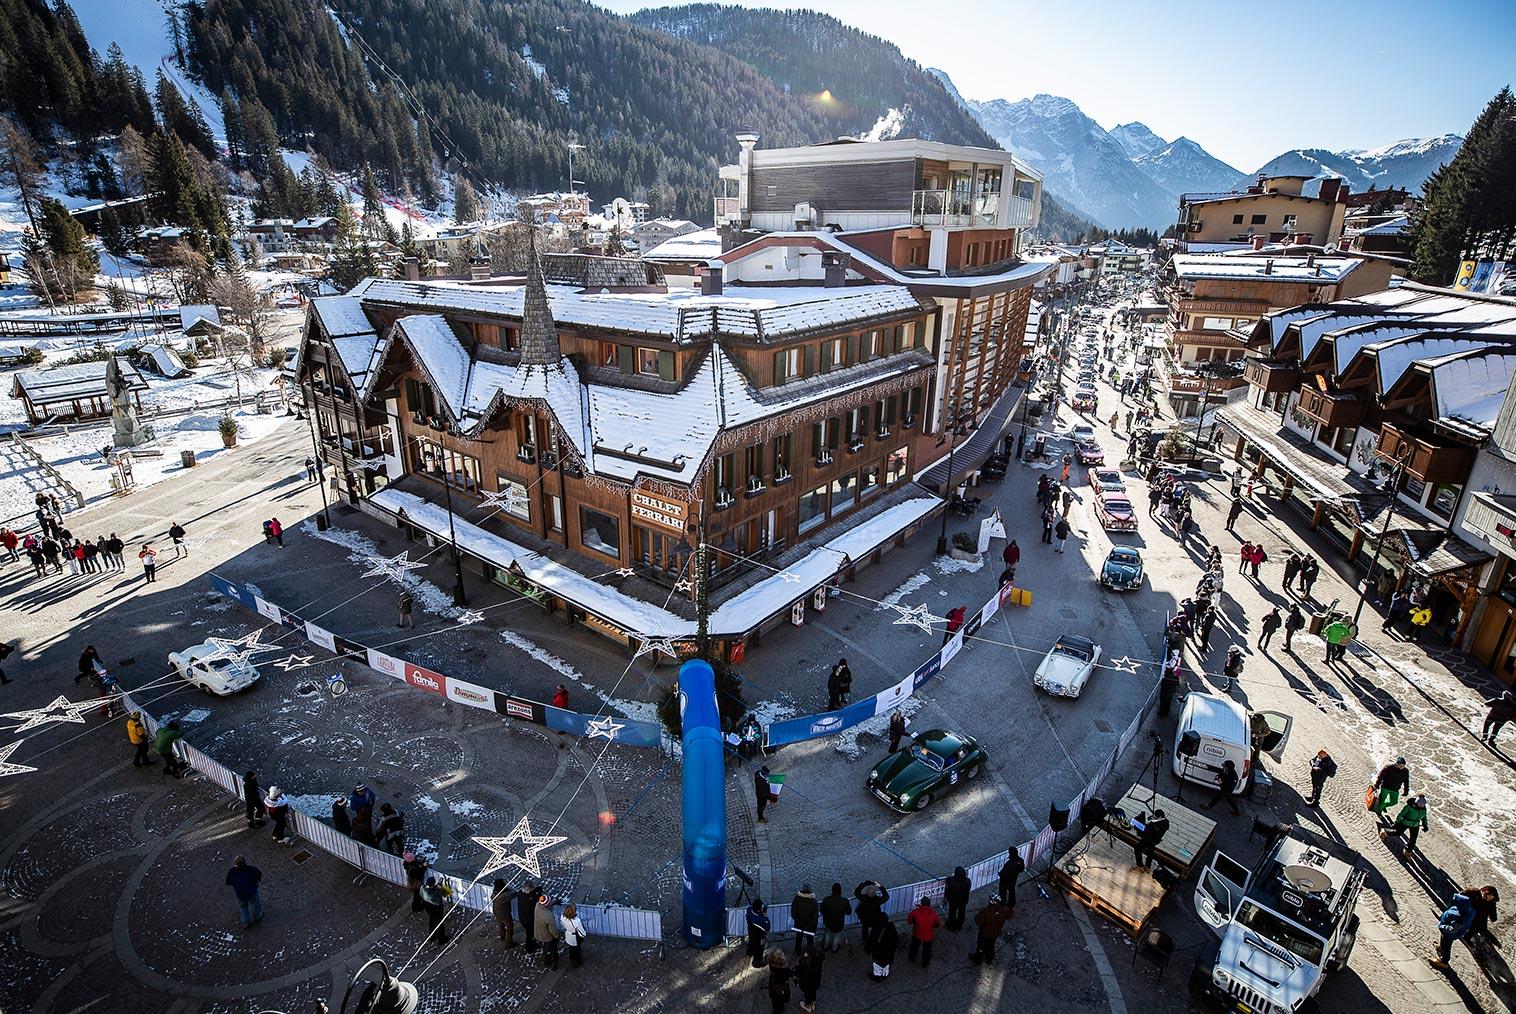 Online the entry list of the Winter Marathon 2020